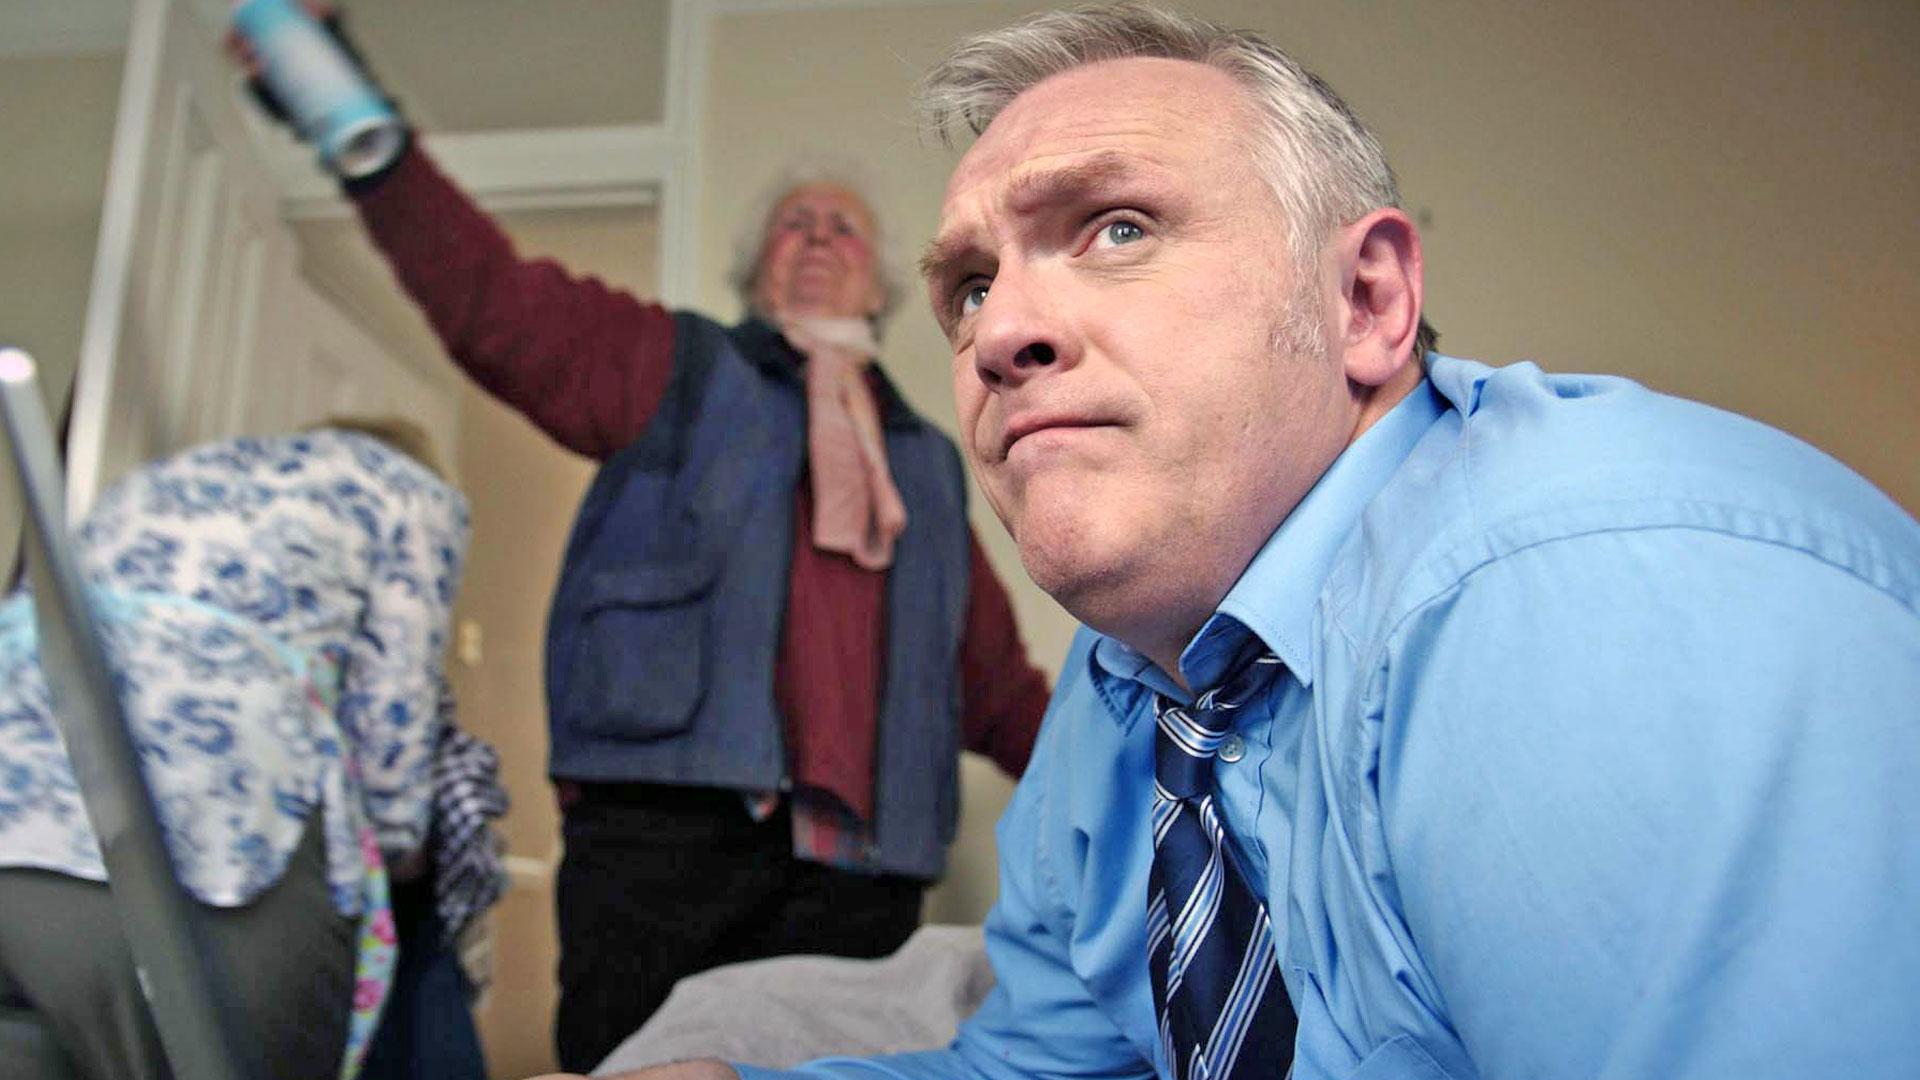 Series 3 Episode 1: The Heist